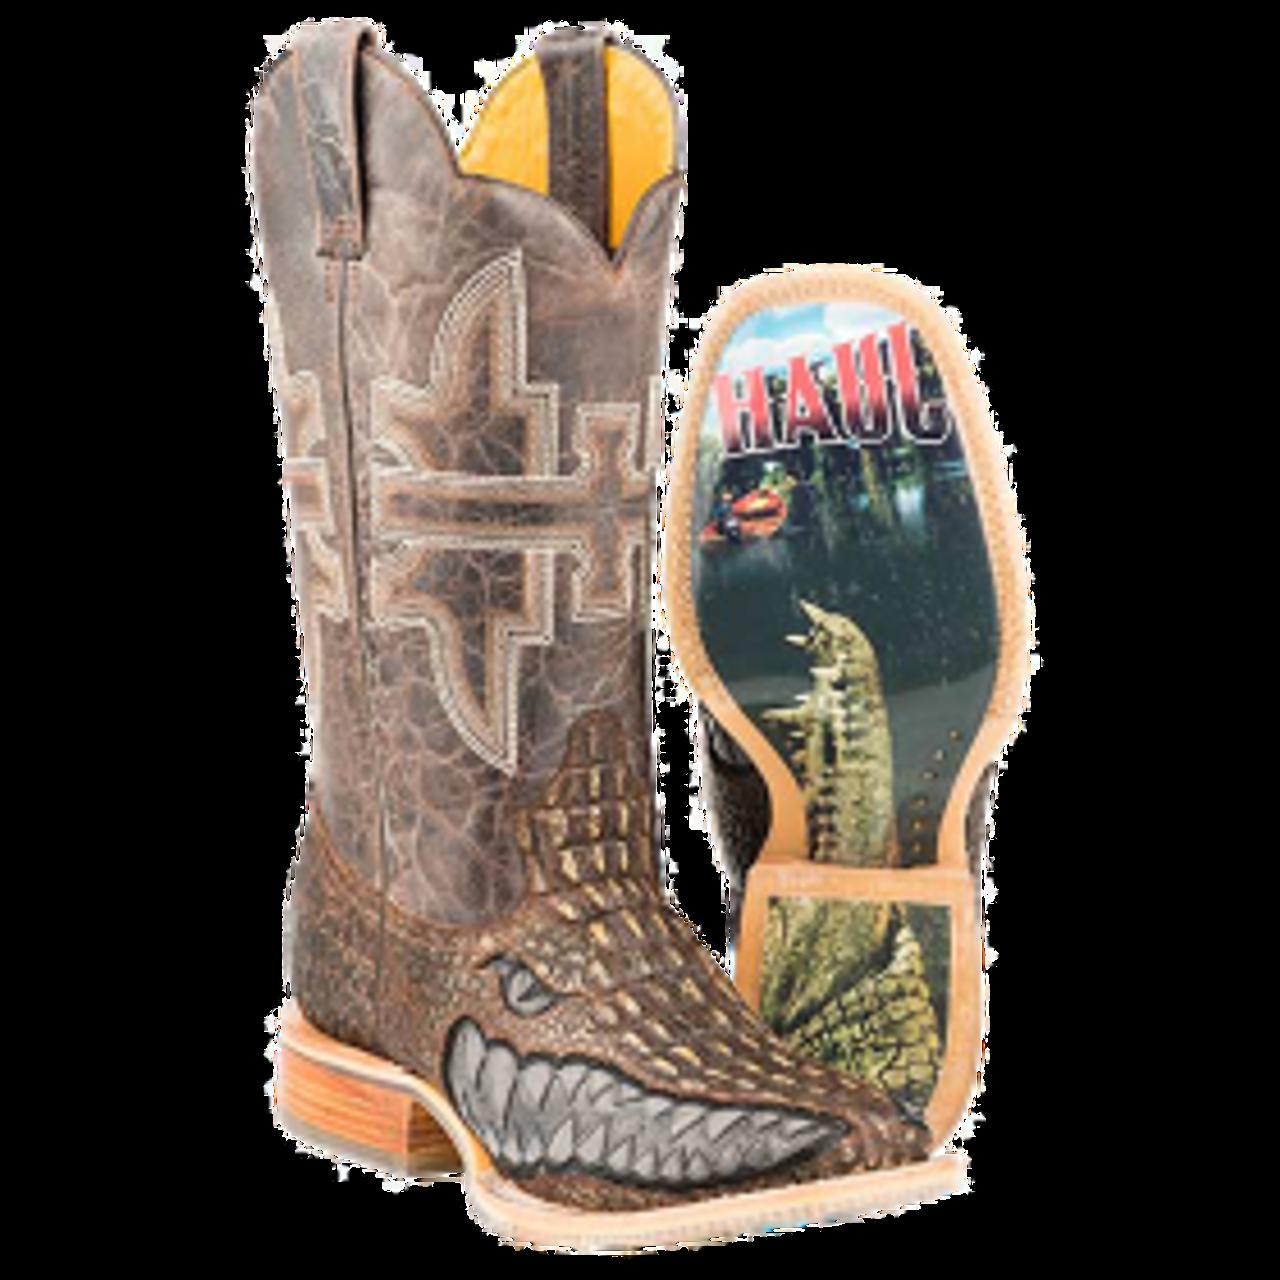 8280e809962 Tin Haul Men's Boots - Swamp Chomp Gator Sole Cowboy Boot - Brown - Square  Toe